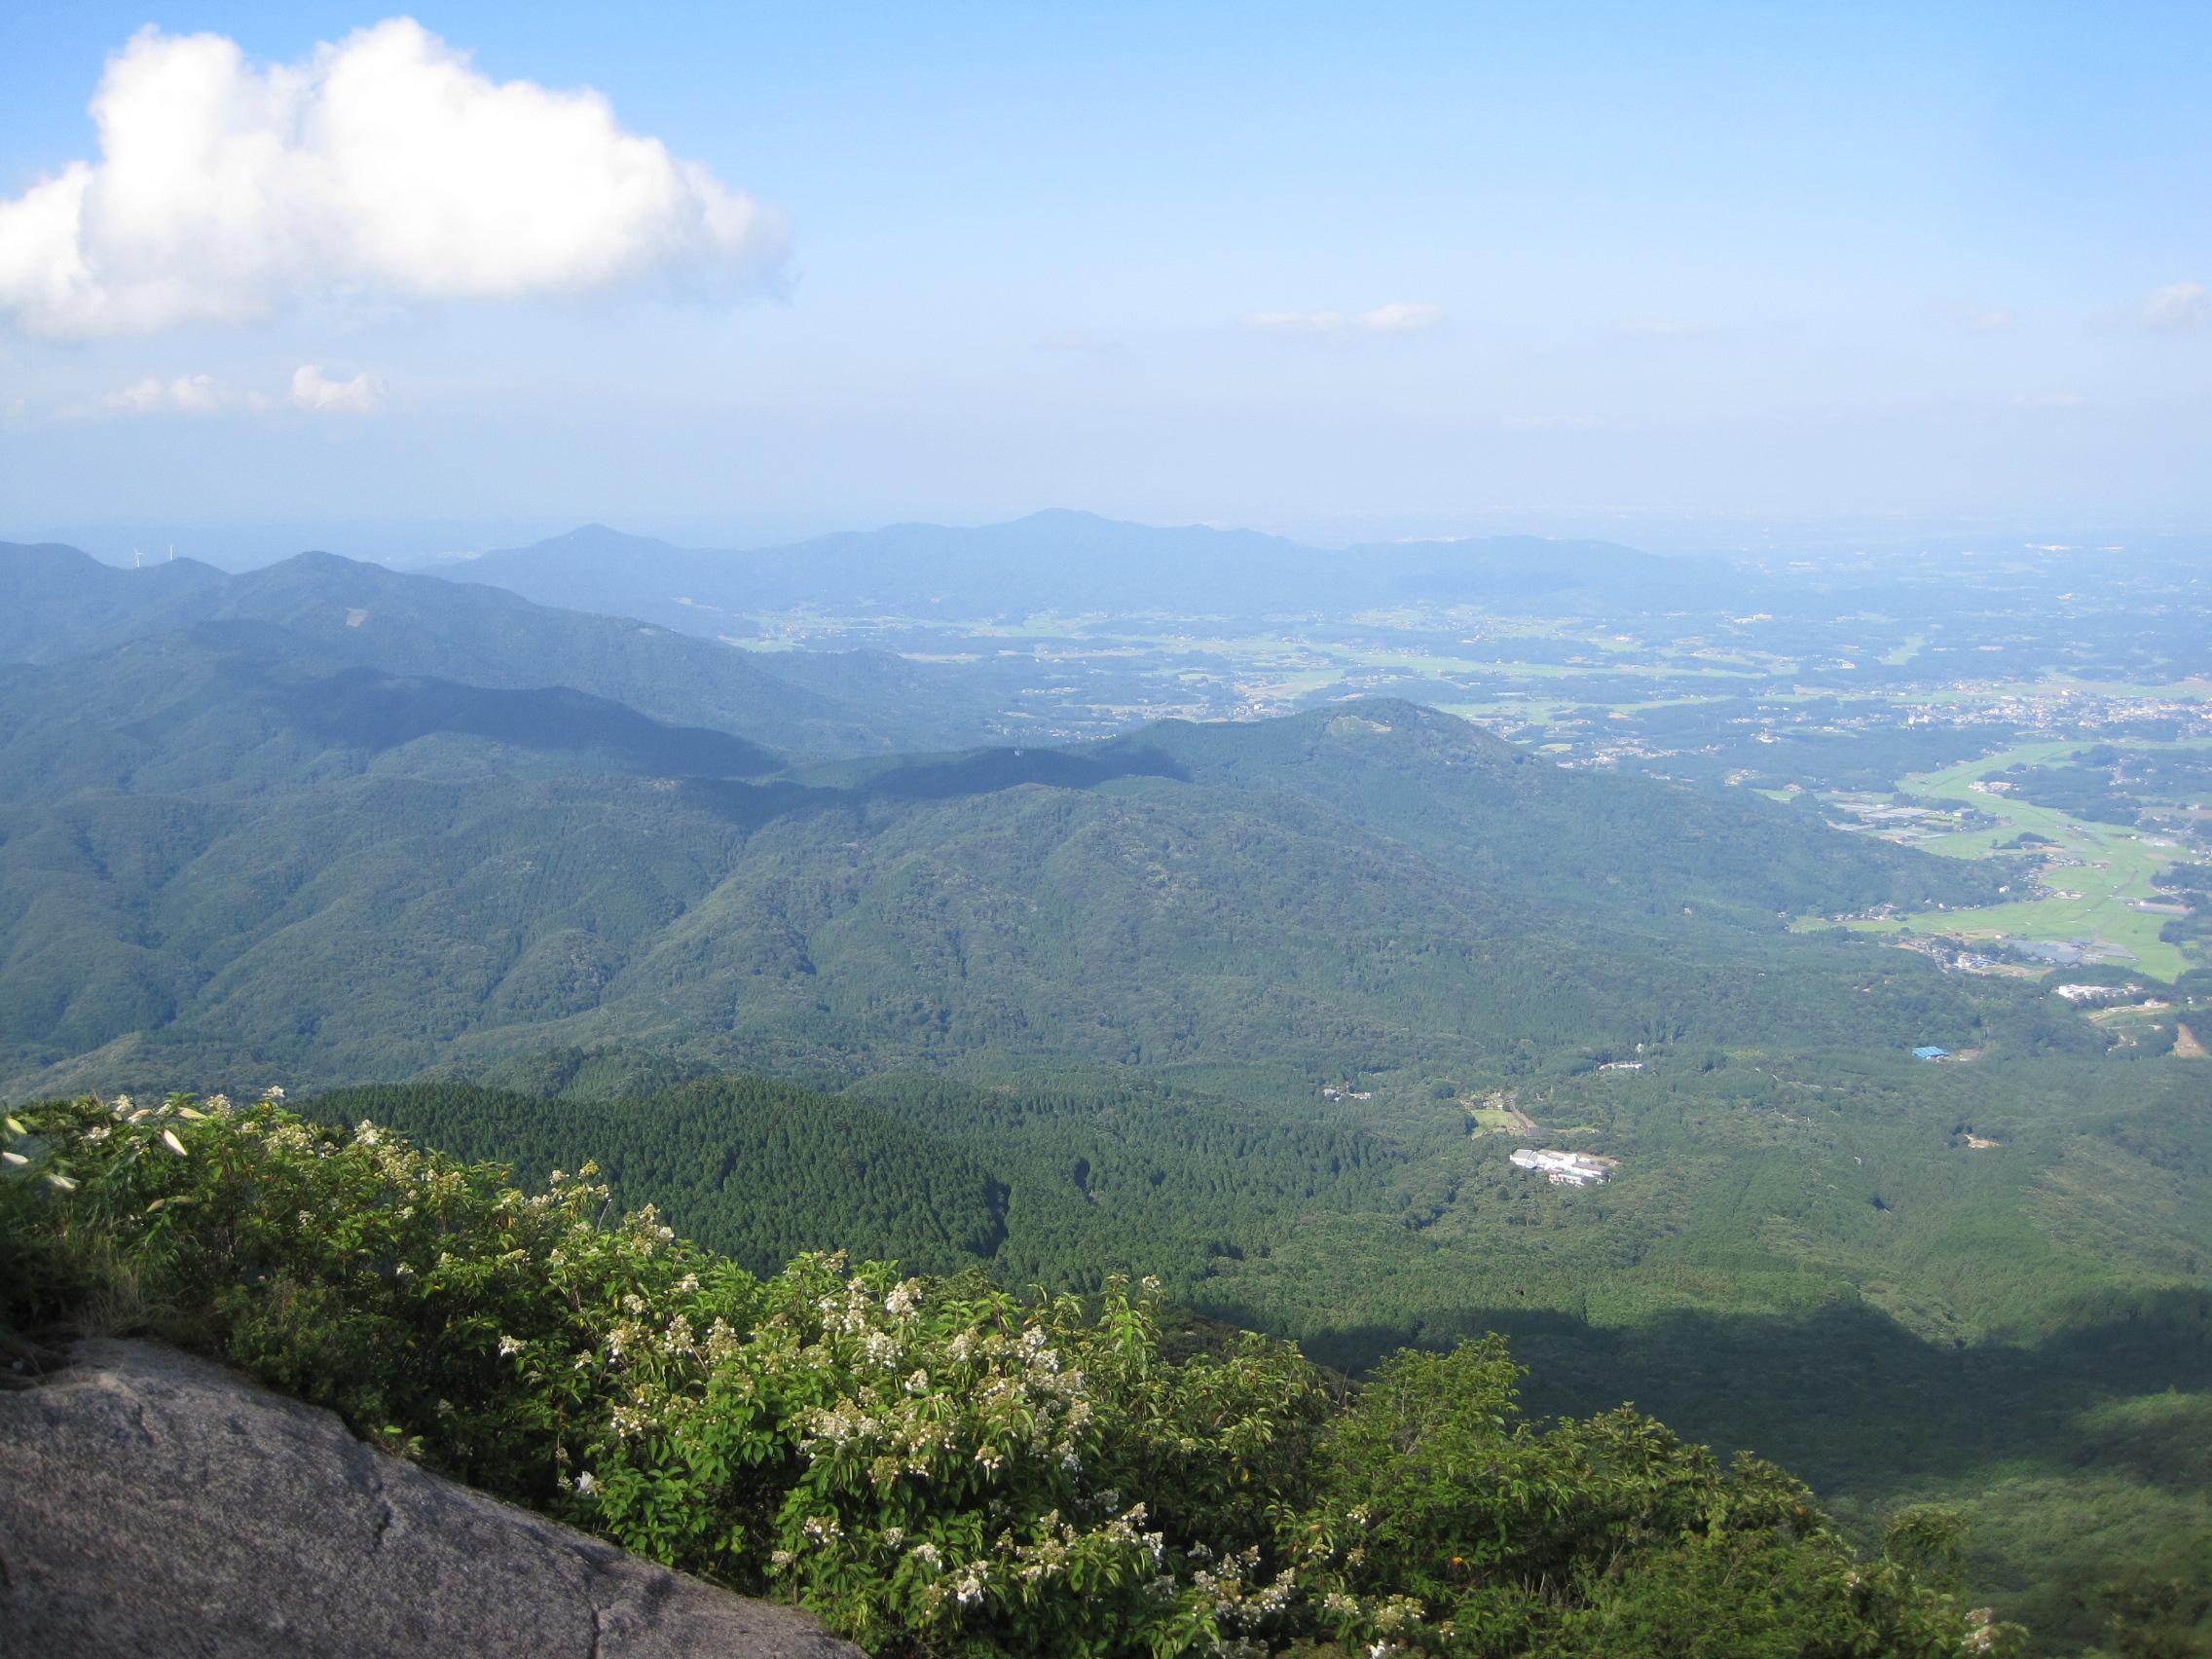 Mt. Tsukuba